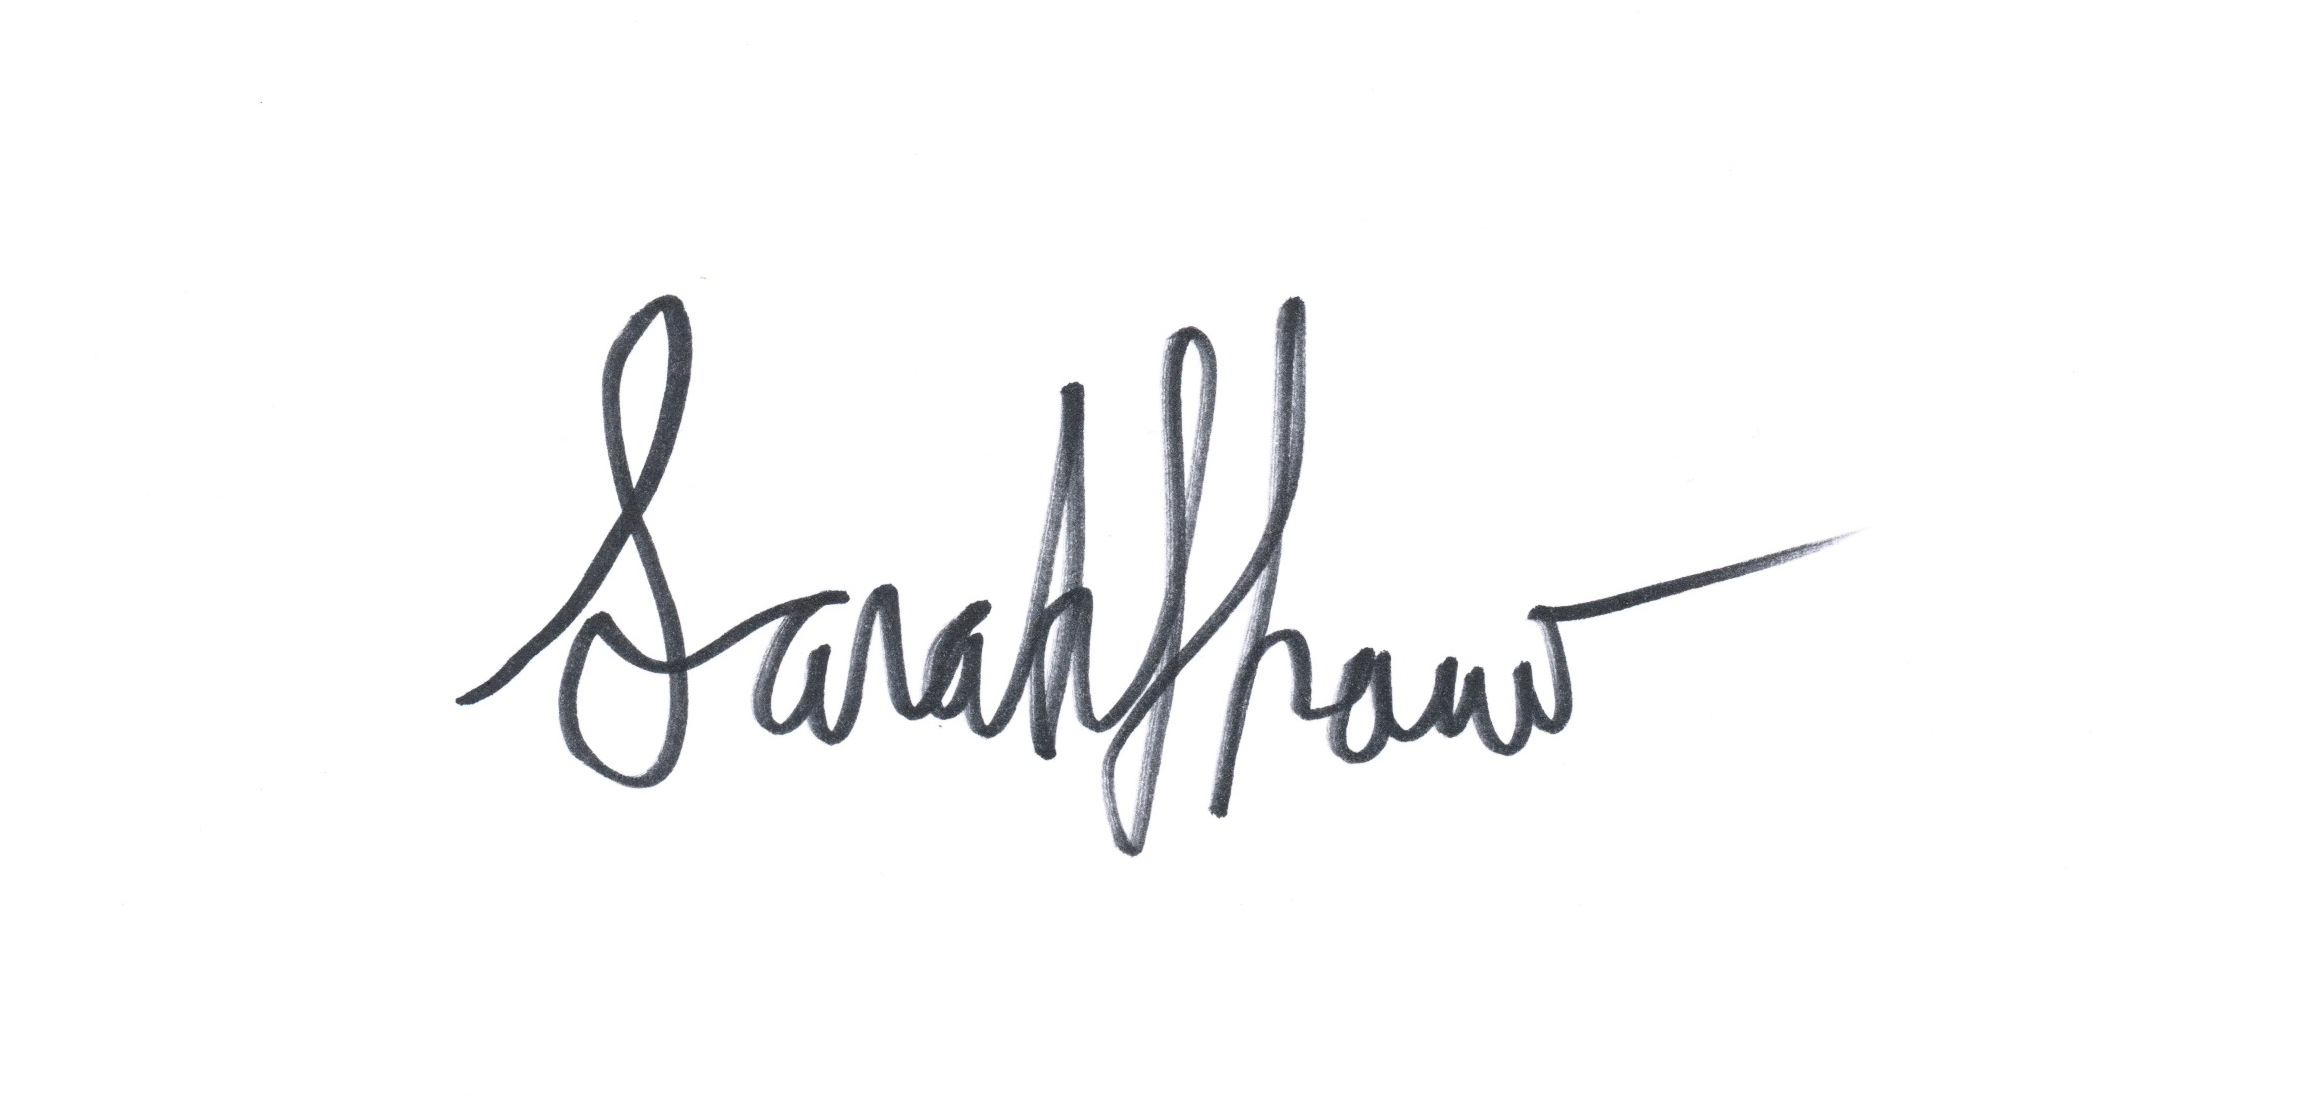 Sarah Anne Shaw's Signature